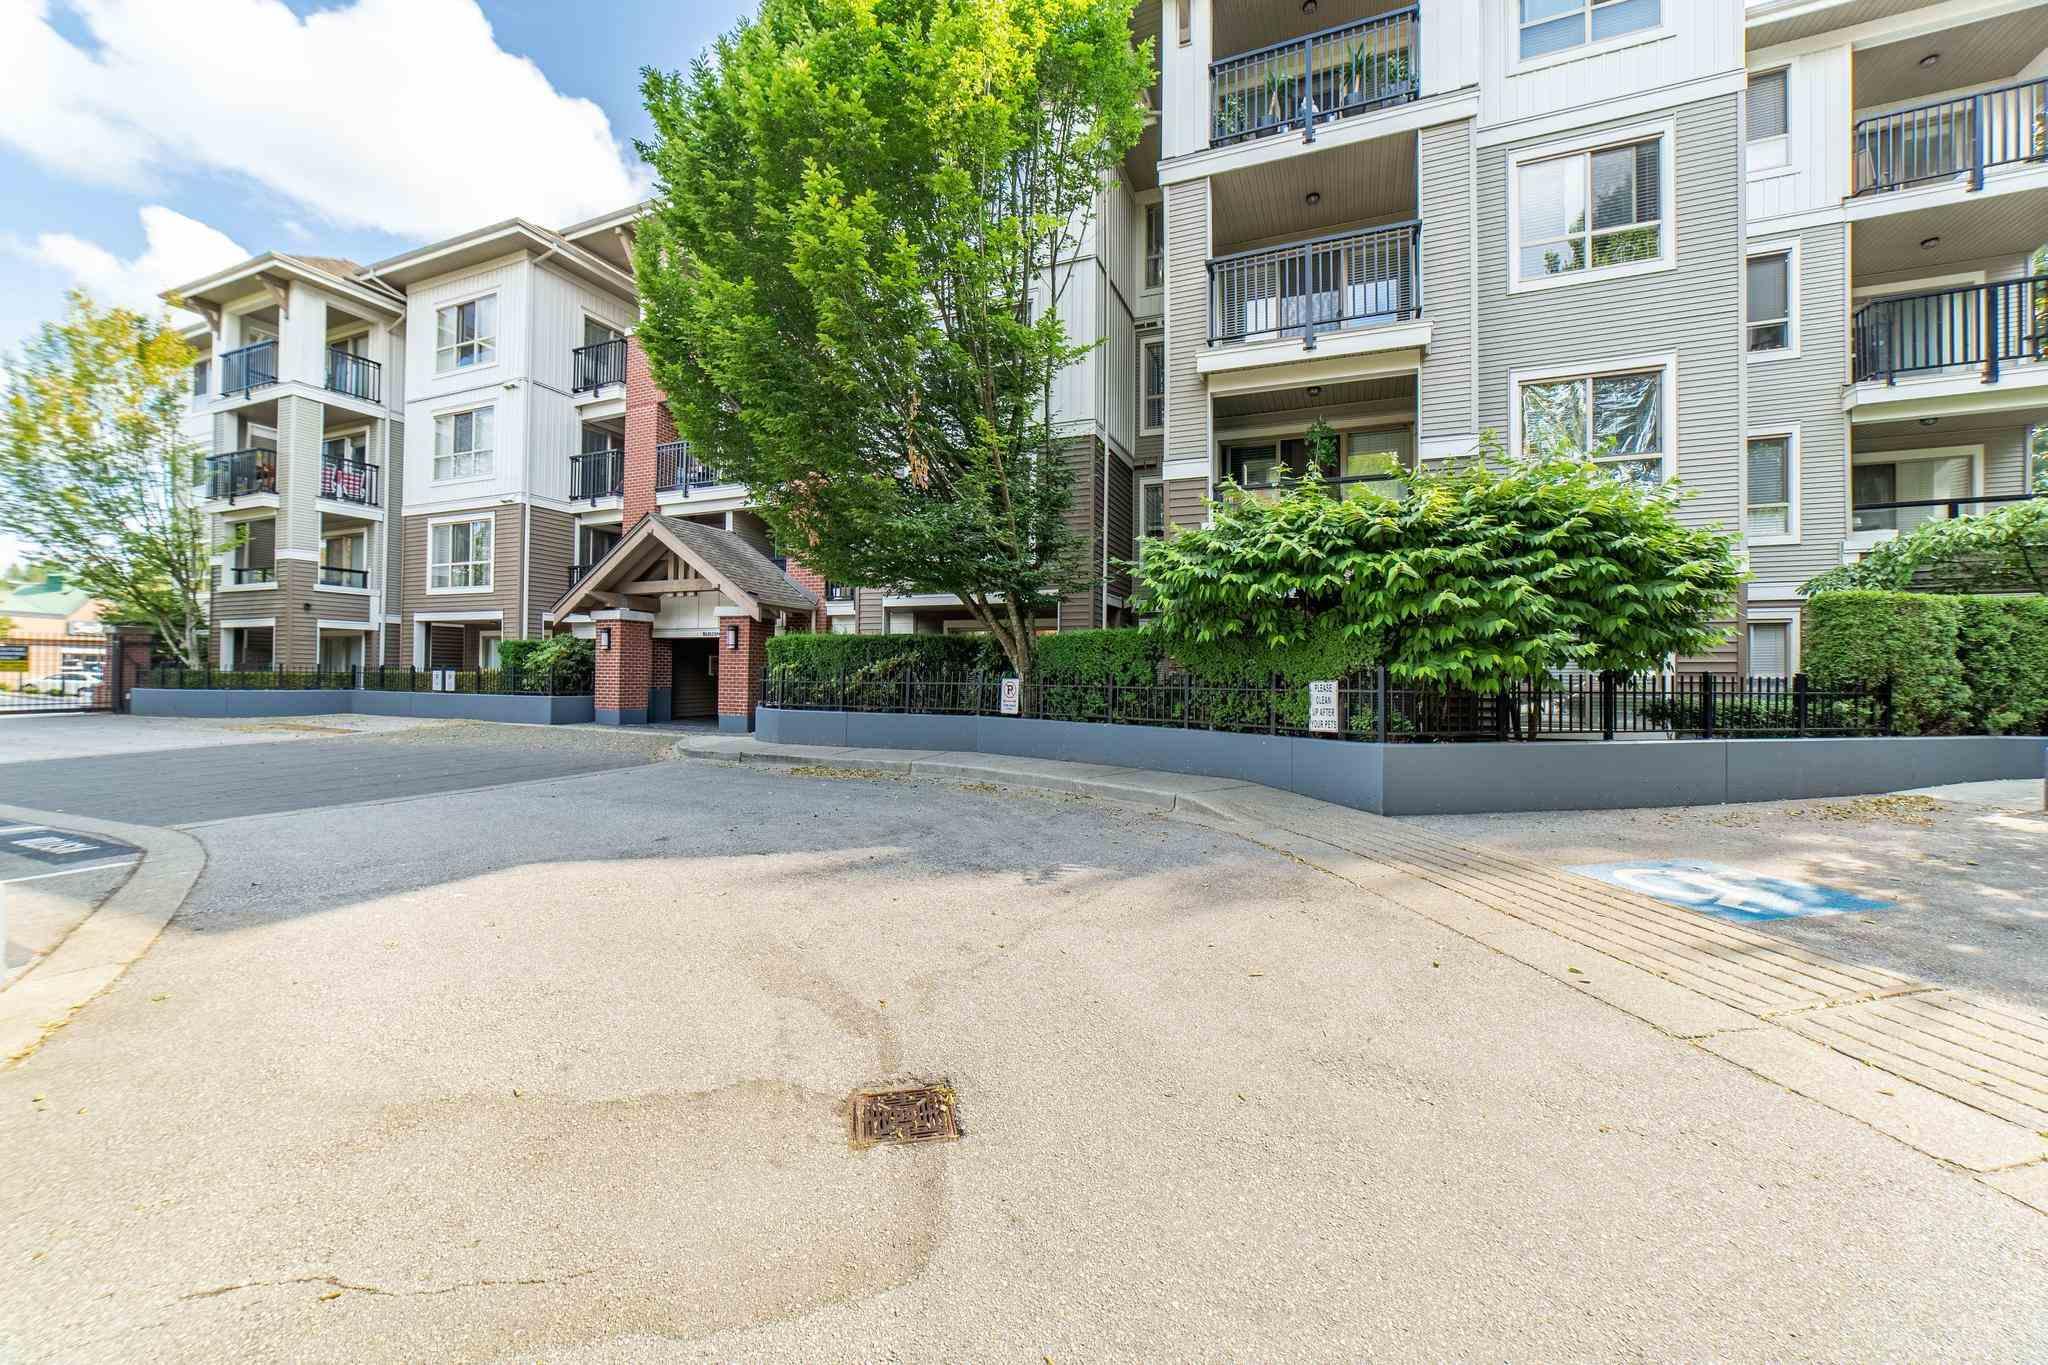 B208 8929 202 STREET - Walnut Grove Apartment/Condo for sale, 1 Bedroom (R2599622) - #1